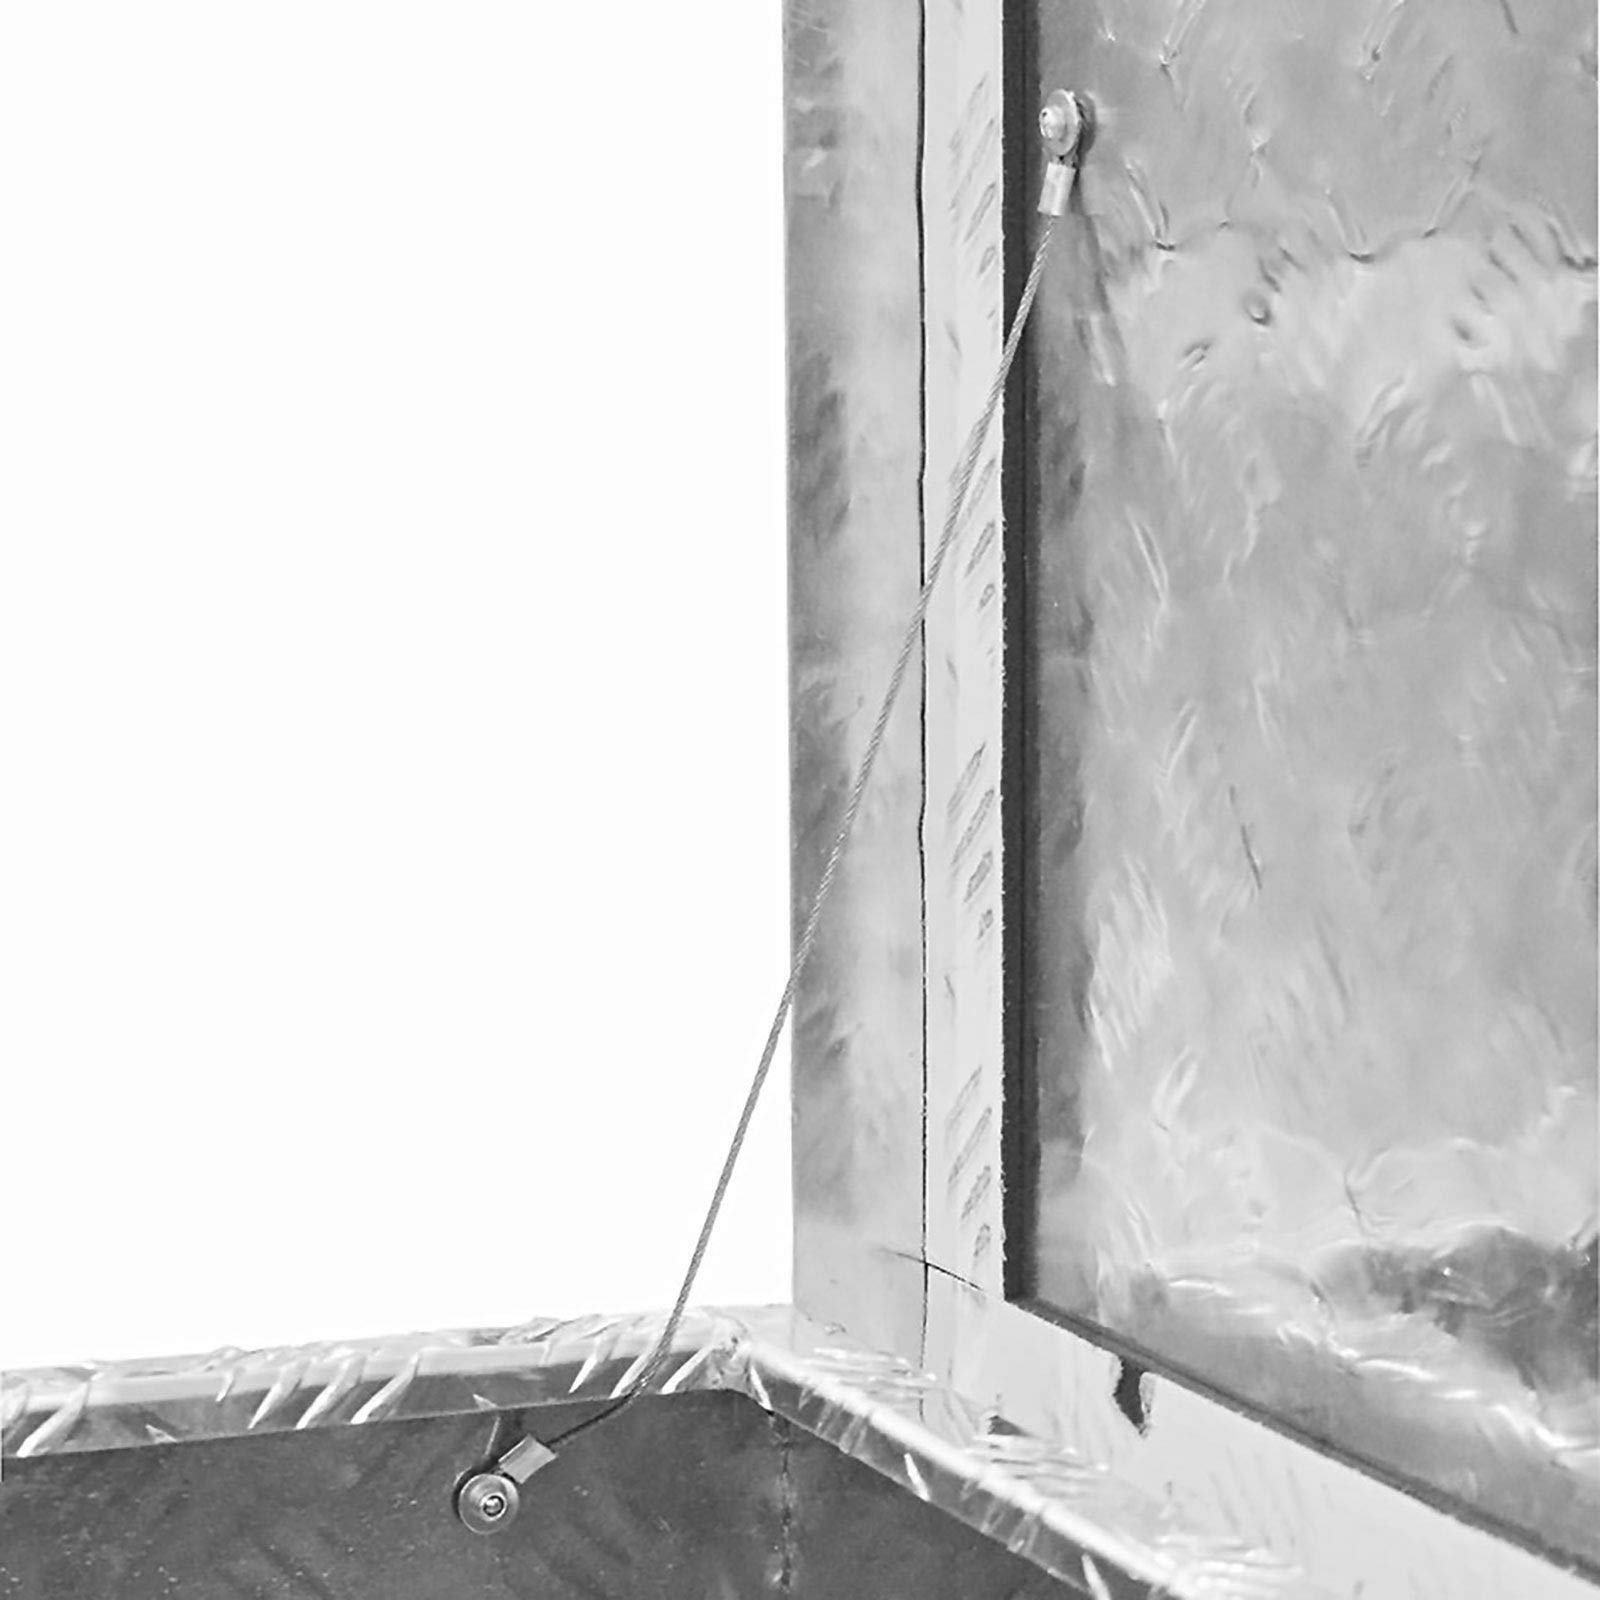 JUMBO Aluminium Riffelblech-Box Alu 70 Liter ALUT70 L 522 x B 375 x H 415 mm ALU-Box Kiste Transport-Box Tränenblech